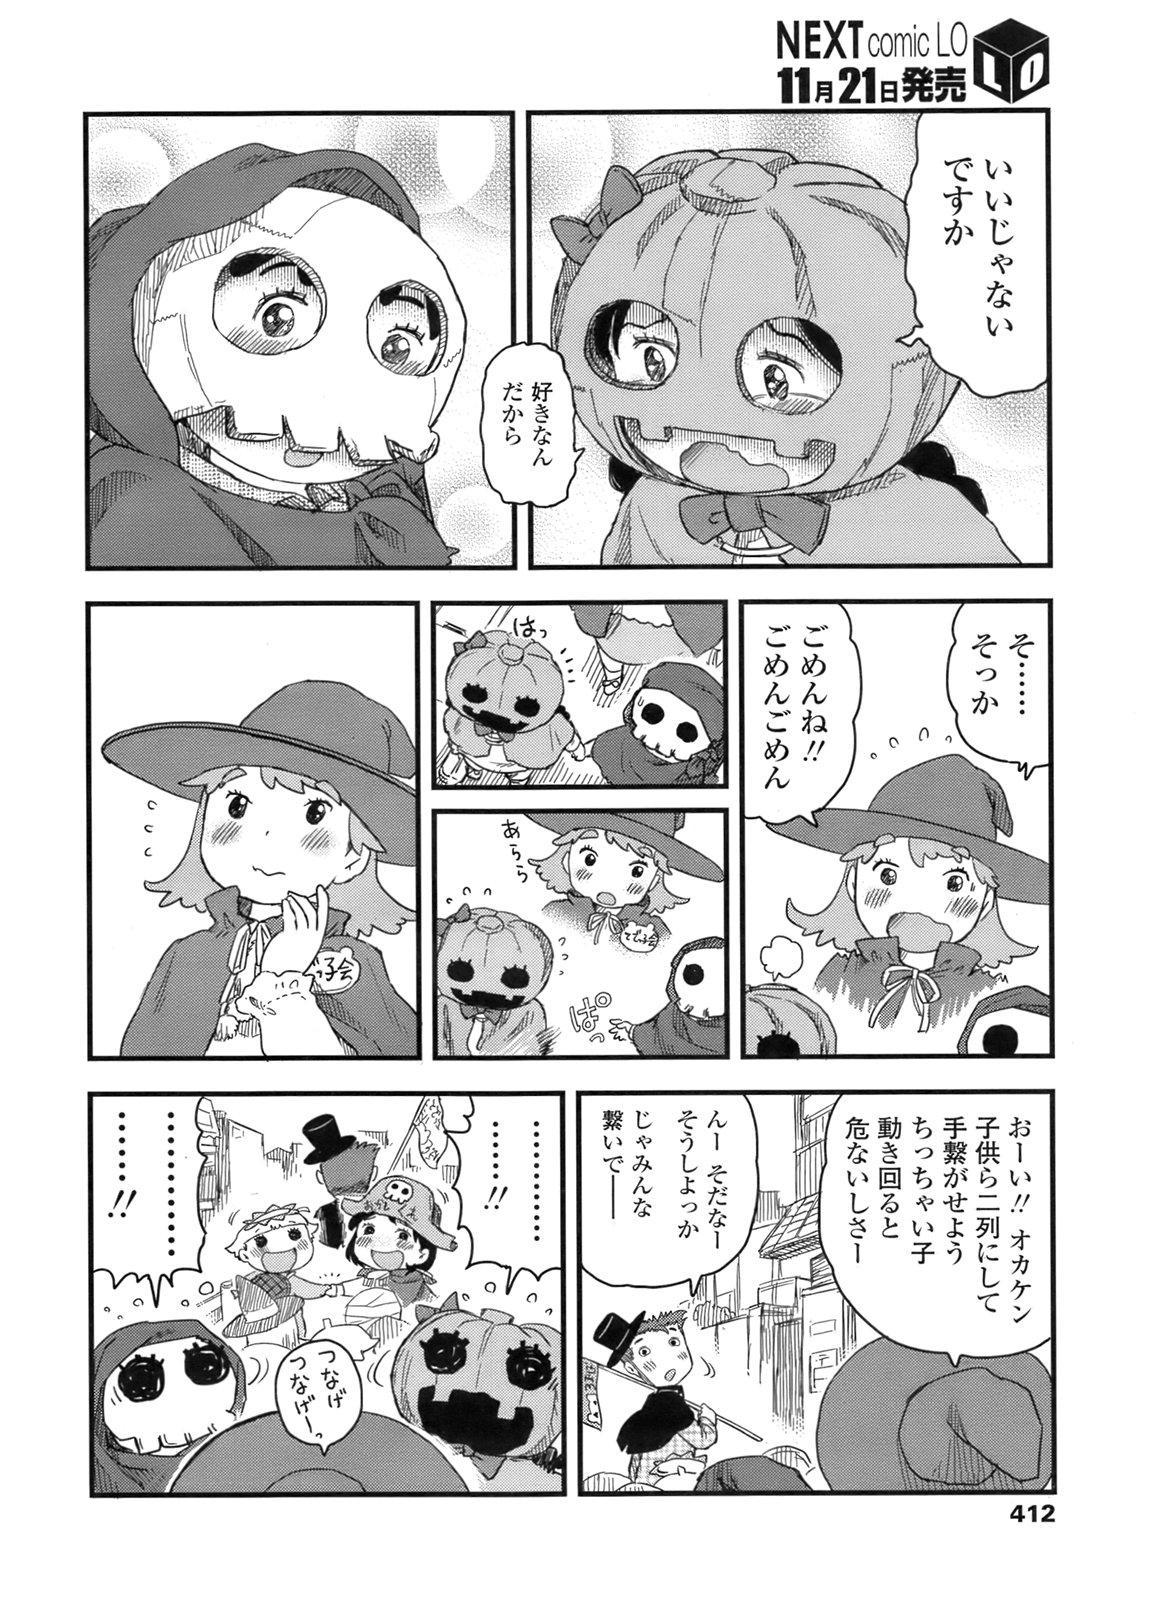 COMIC LO 2011-12 Vol. 93 412